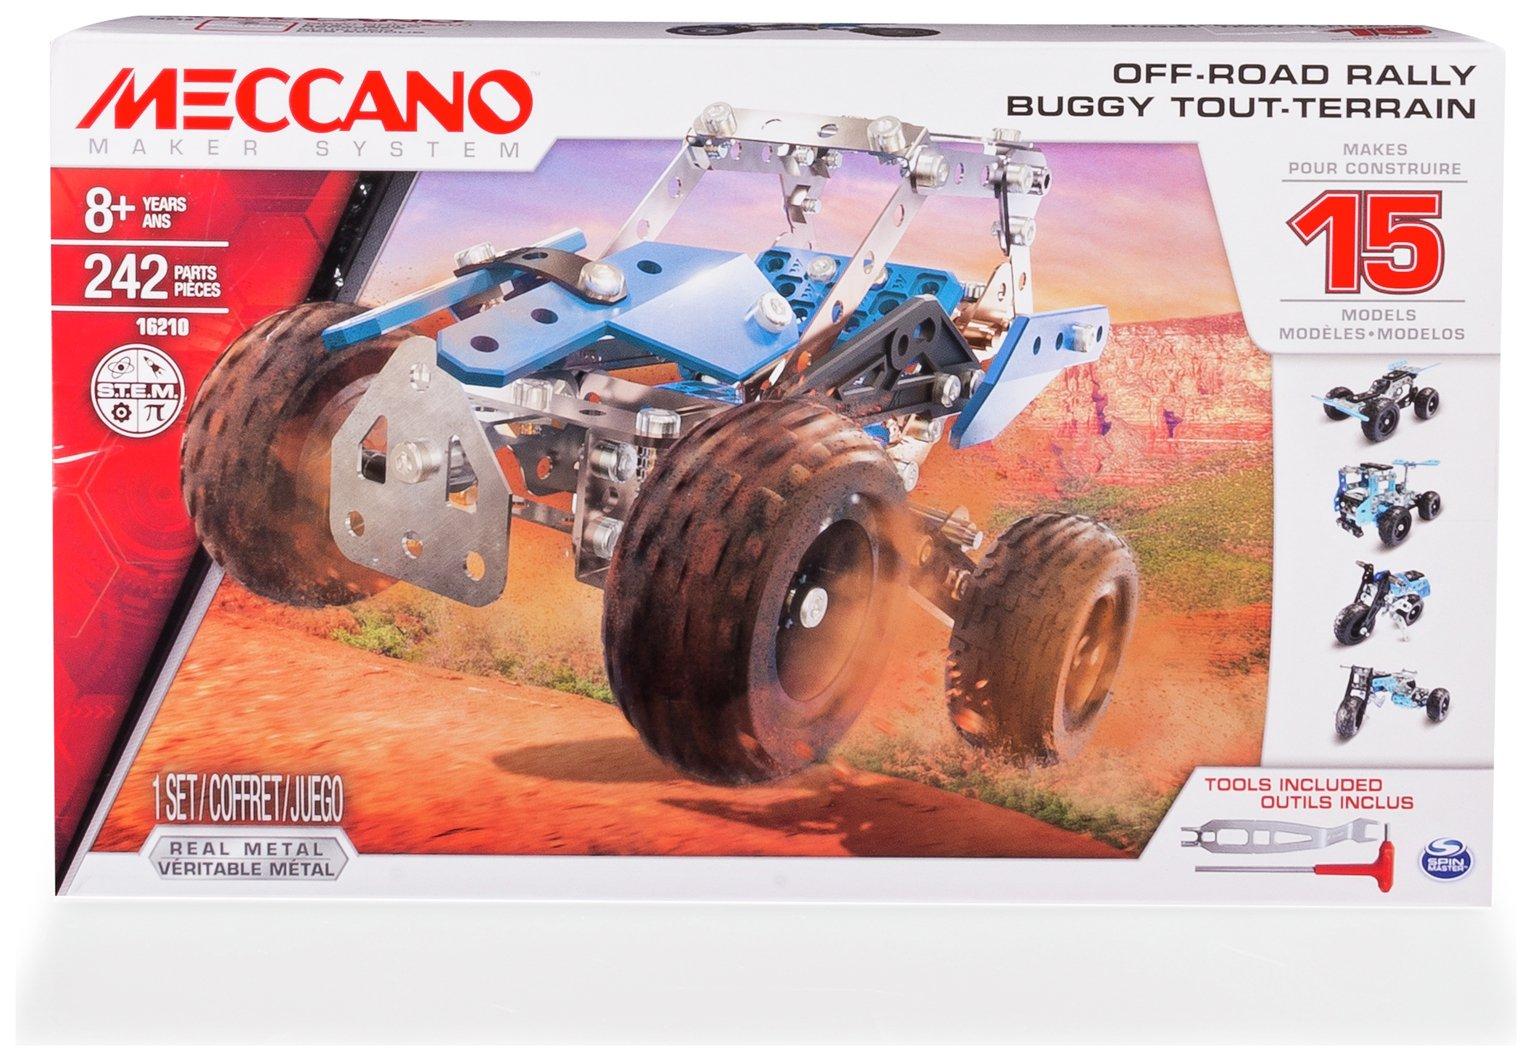 Meccano 15-in-1 Model Motorcycles Set